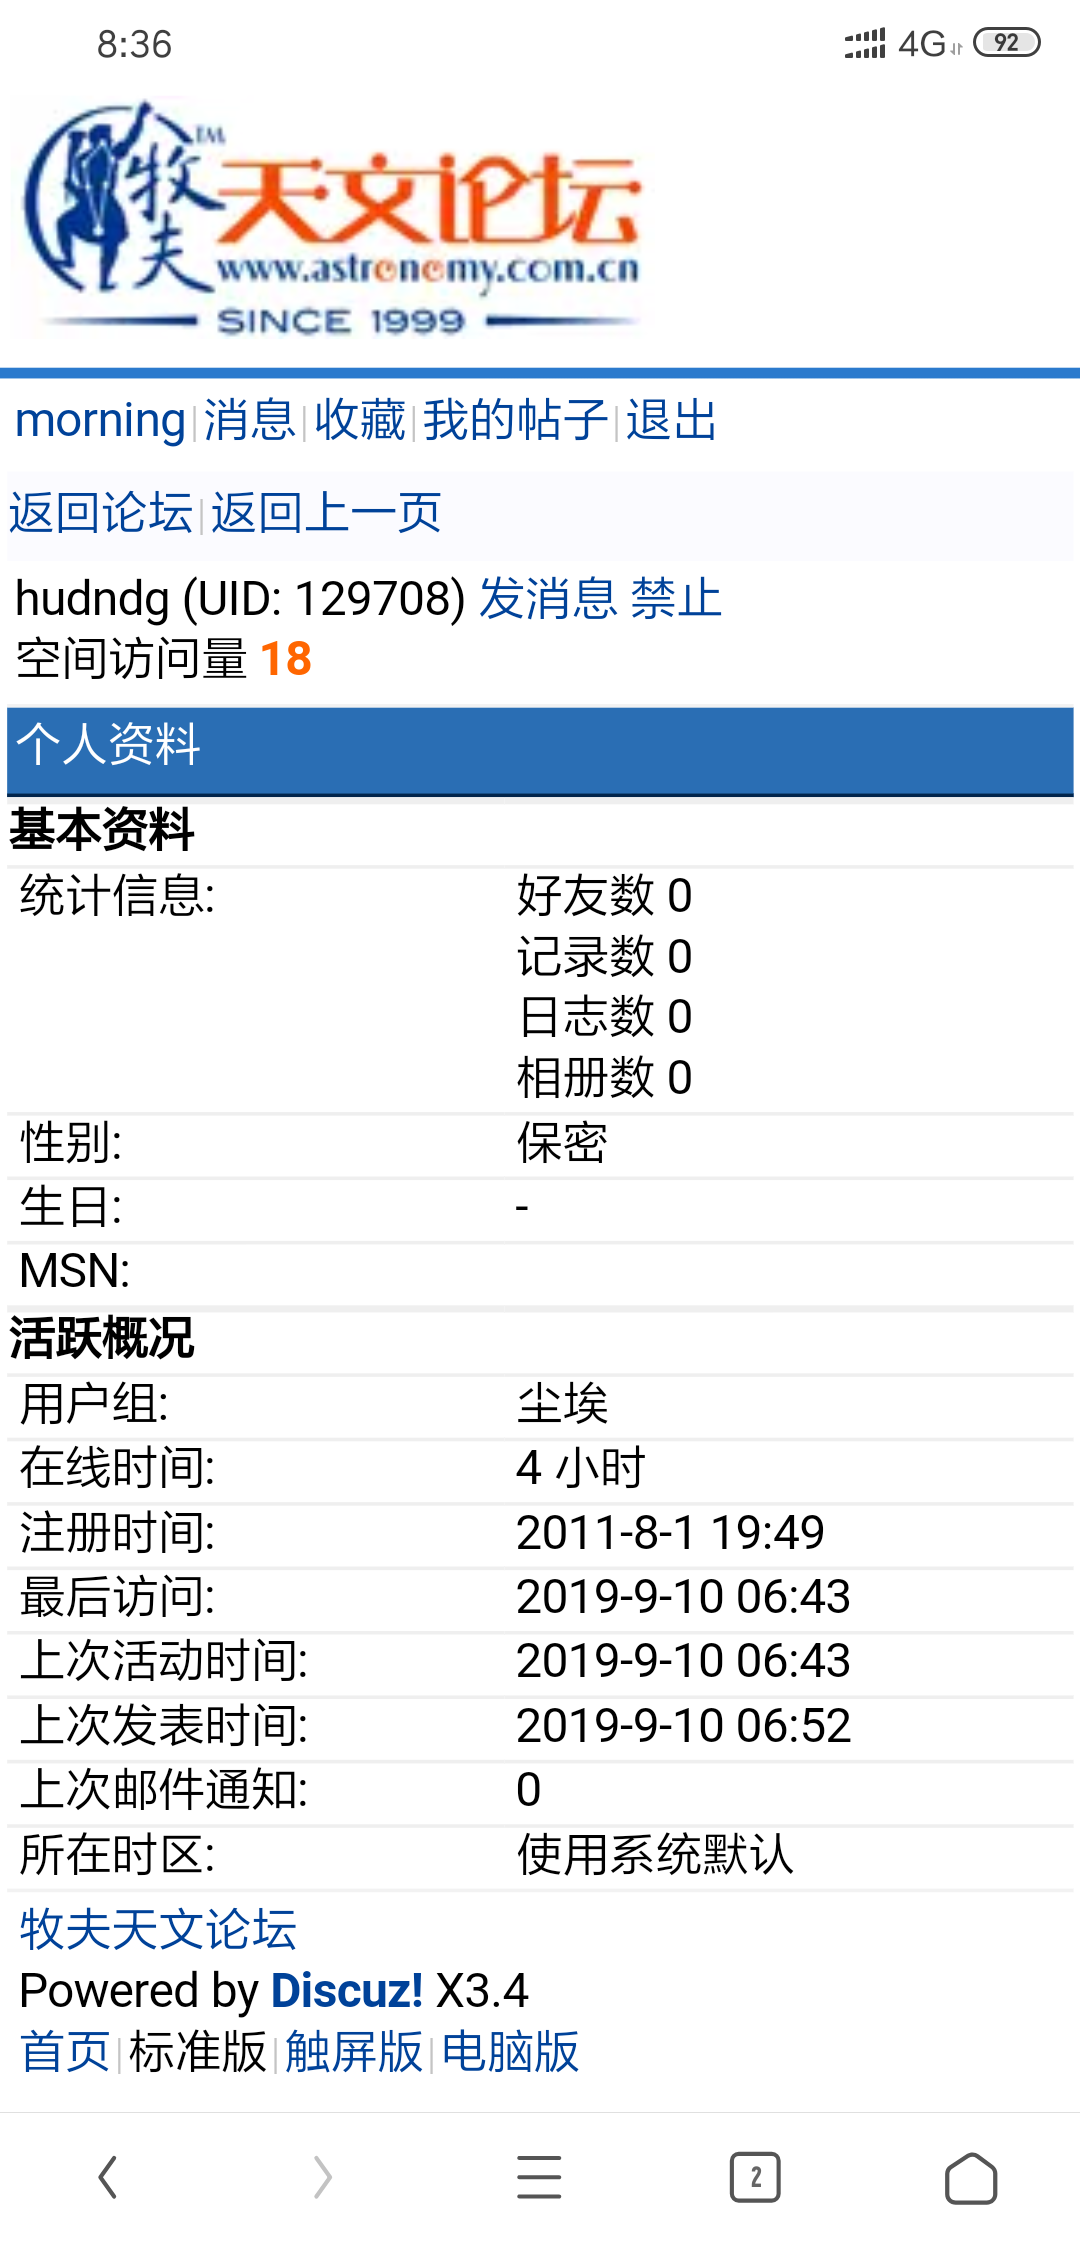 Screenshot_2019-09-10-08-36-40-243_com.UCMobile.png